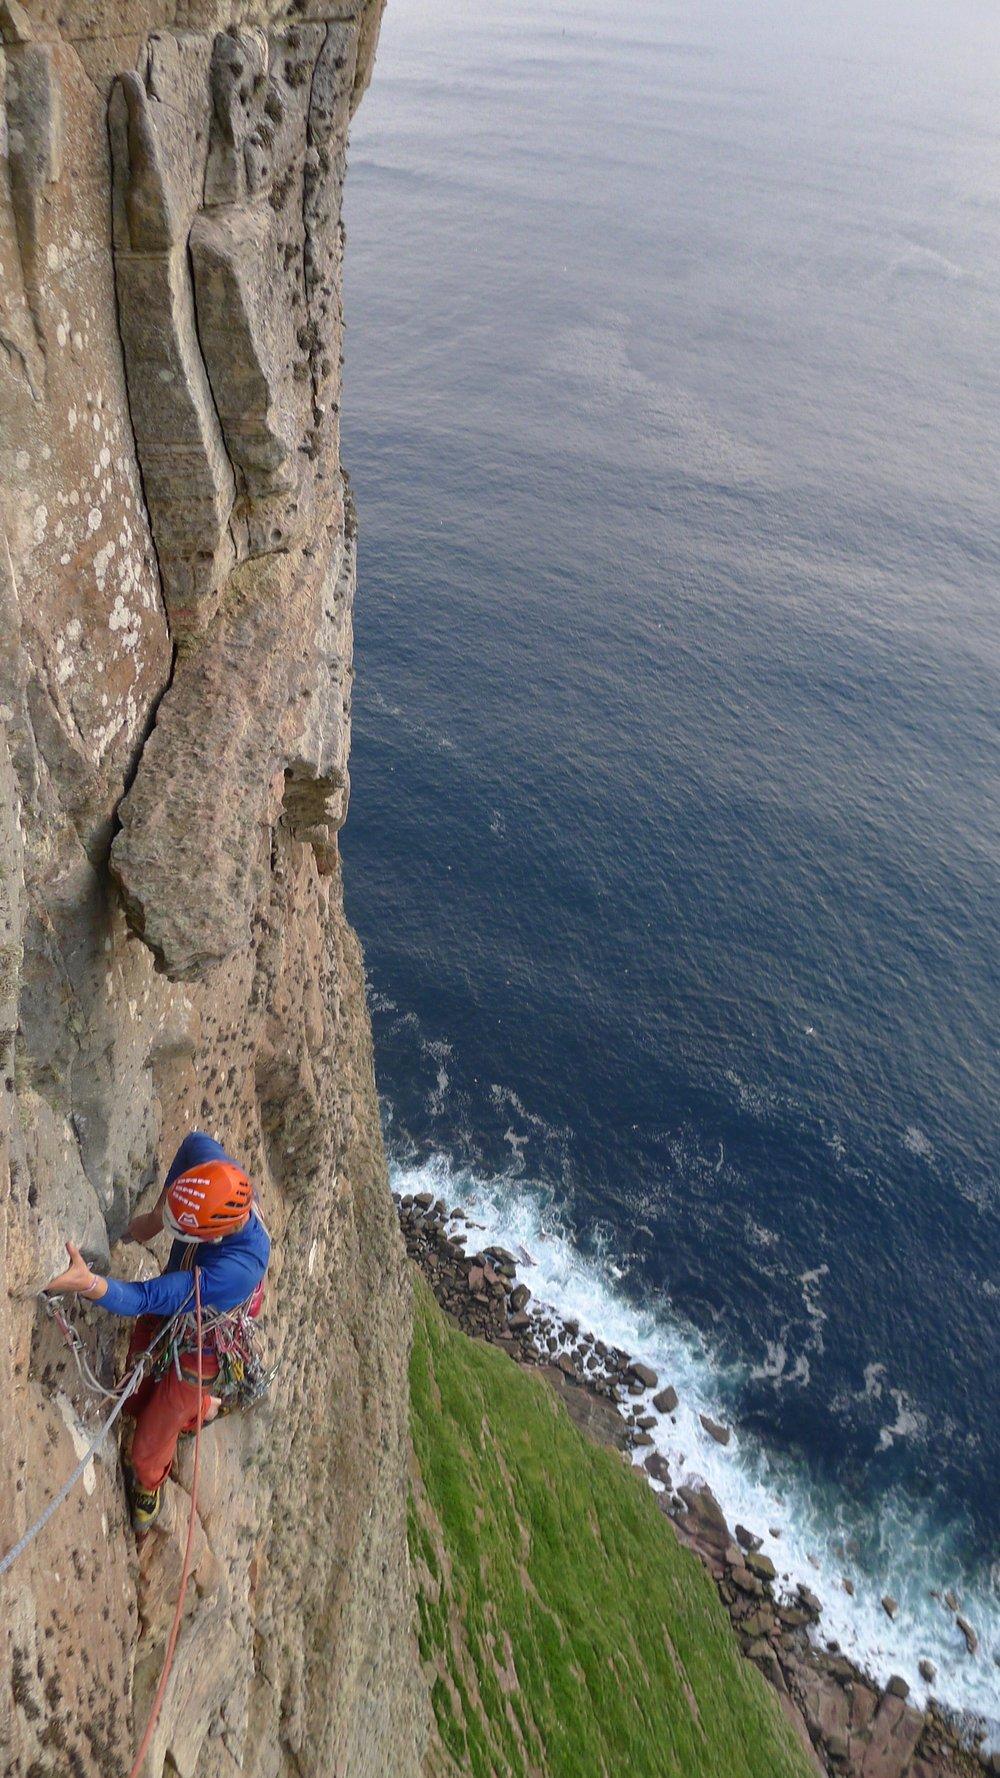 the long hope route (E7 6c), hoy. scotland. photo: tony stone